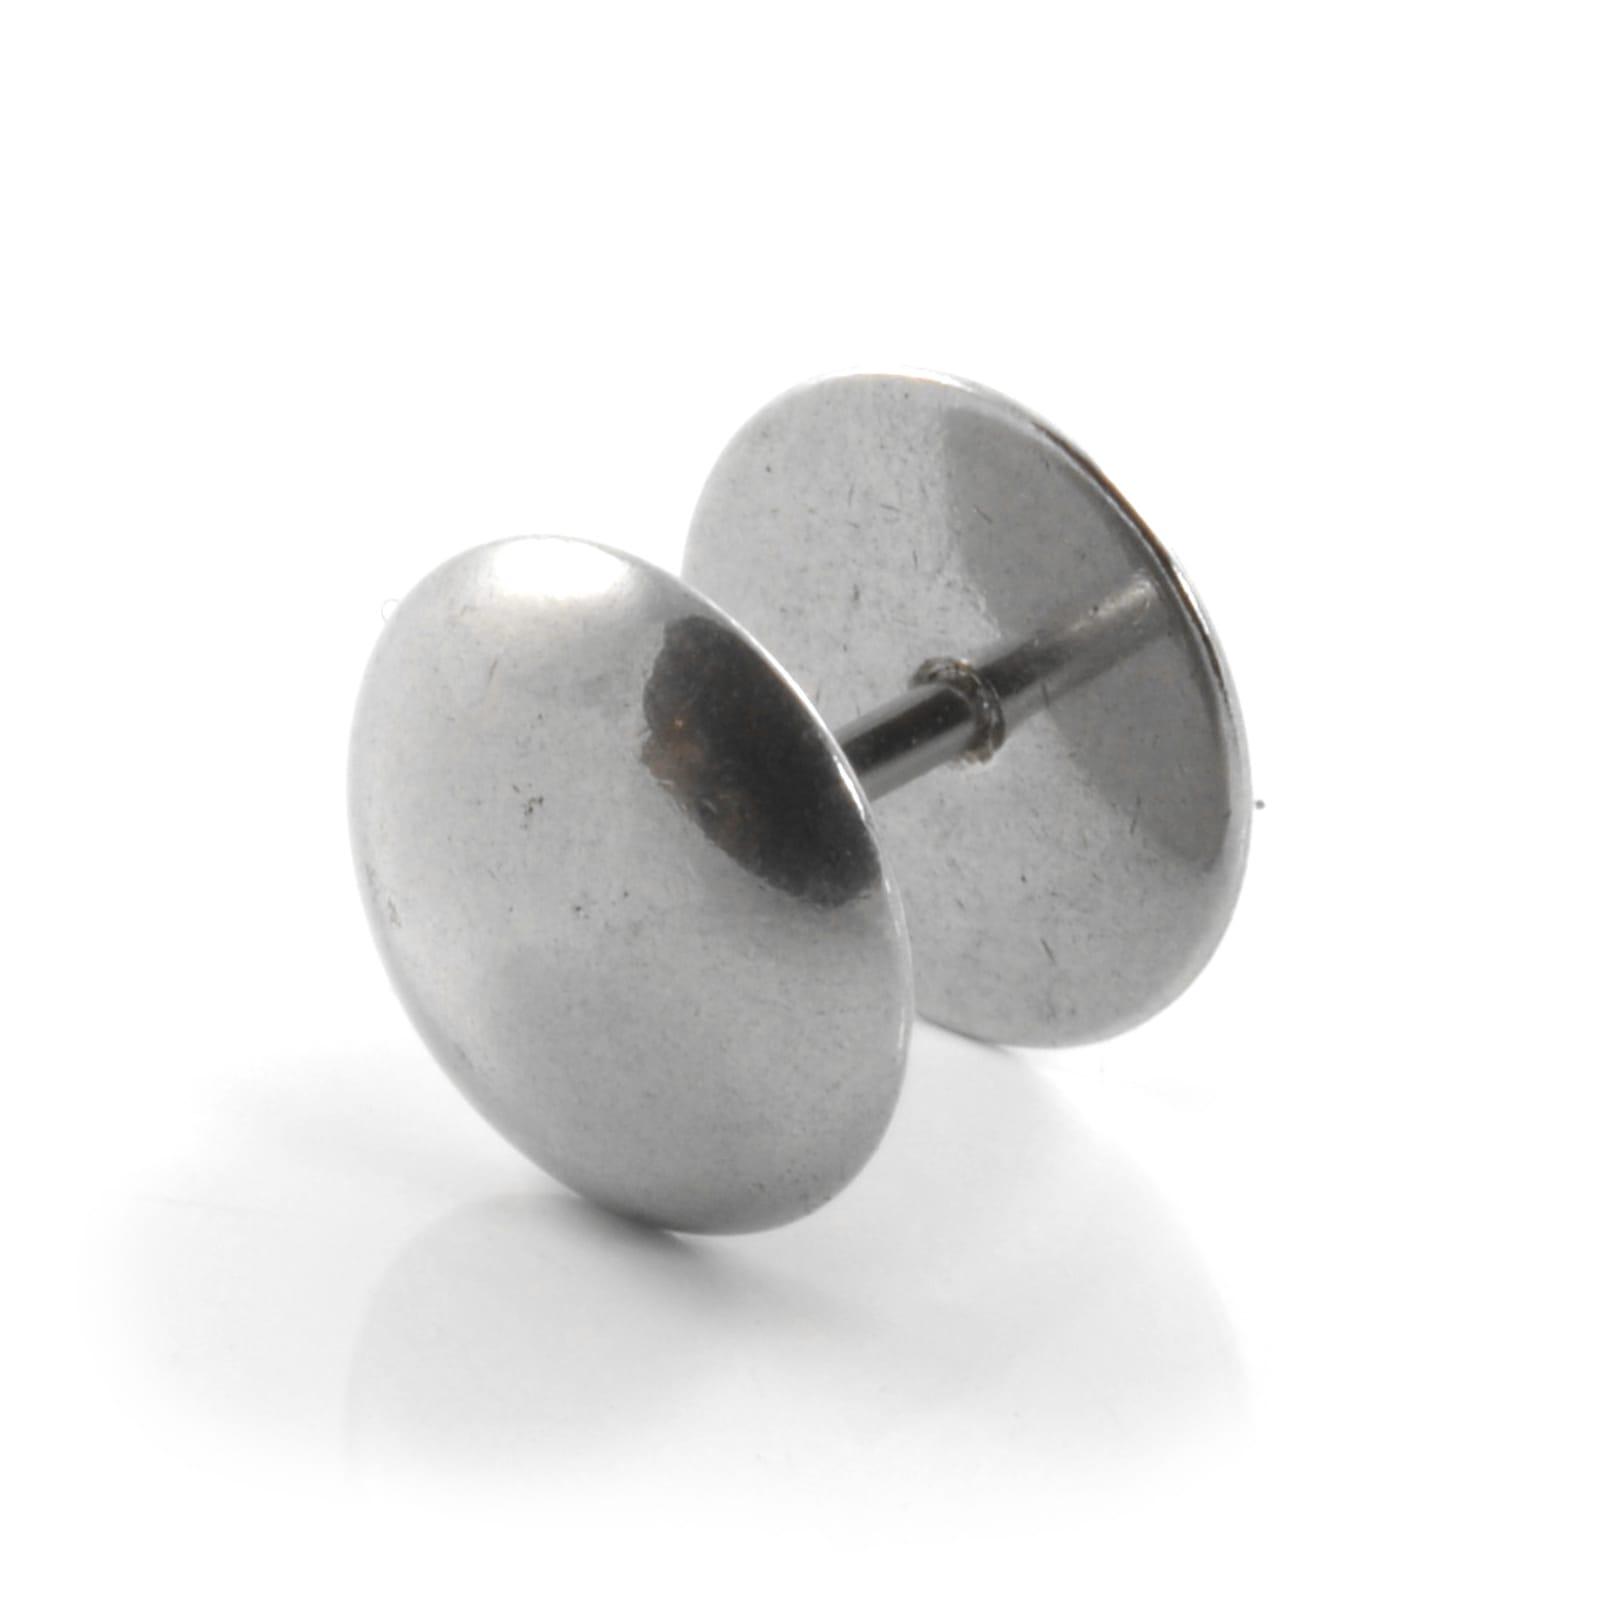 11080610dd7 Stud Σκουλαρίκι Ασημί Σκουλαρίκι 10mm